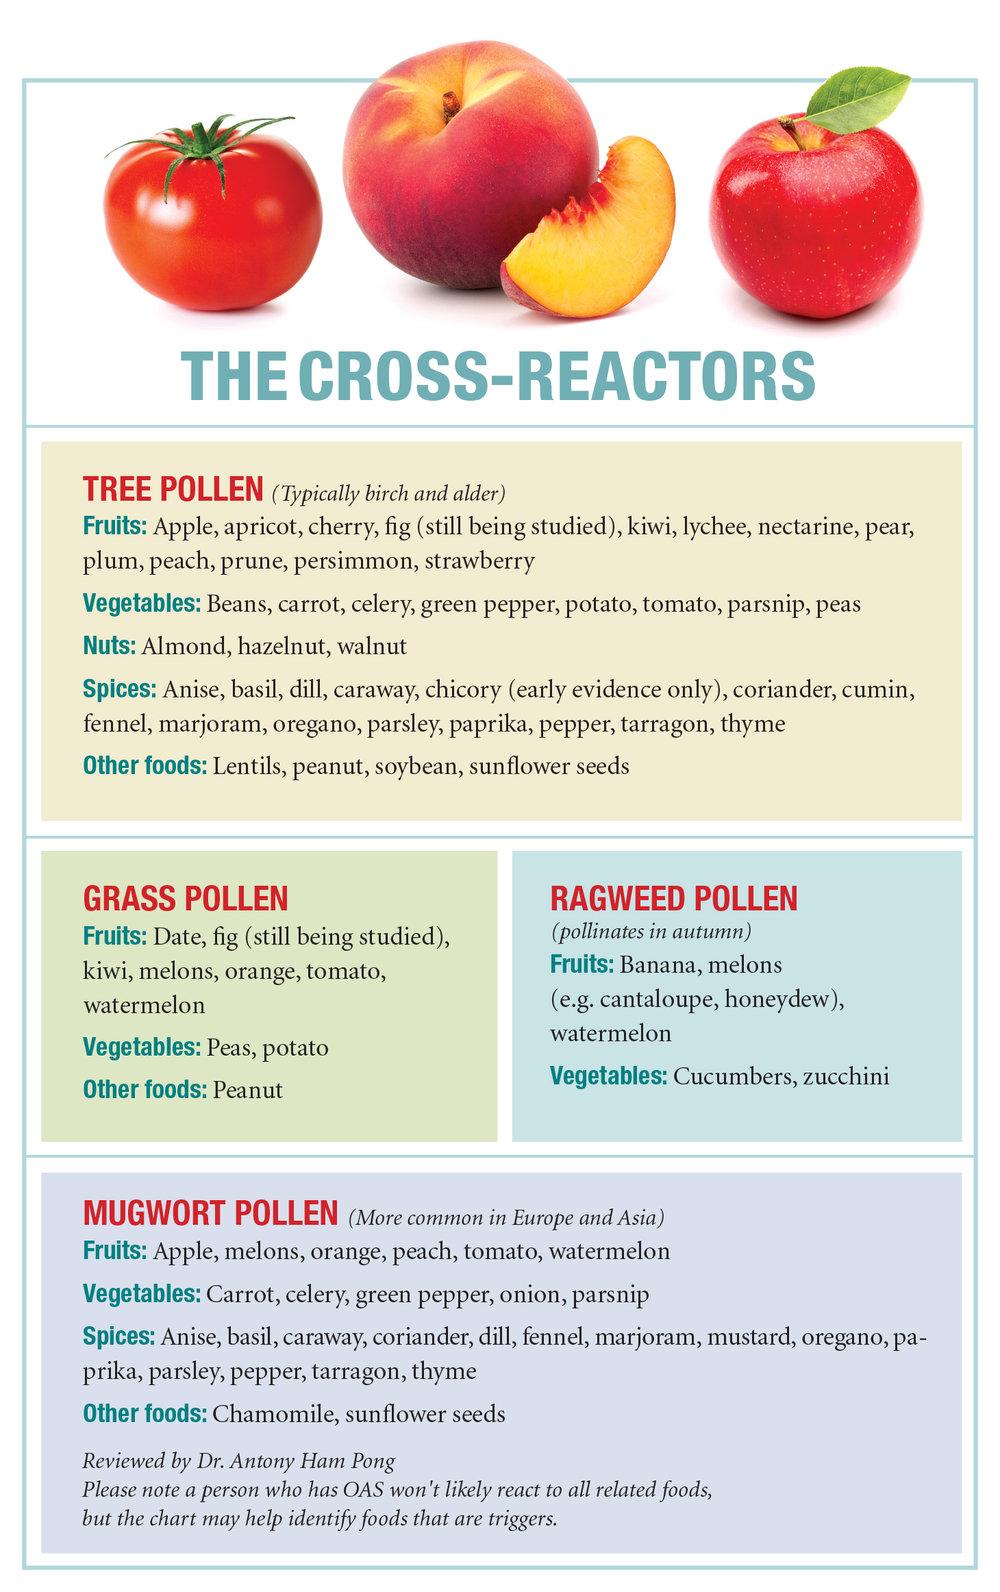 https://allergicliving.com/wp-content/uploads/2016/06/oas-chart.jpg